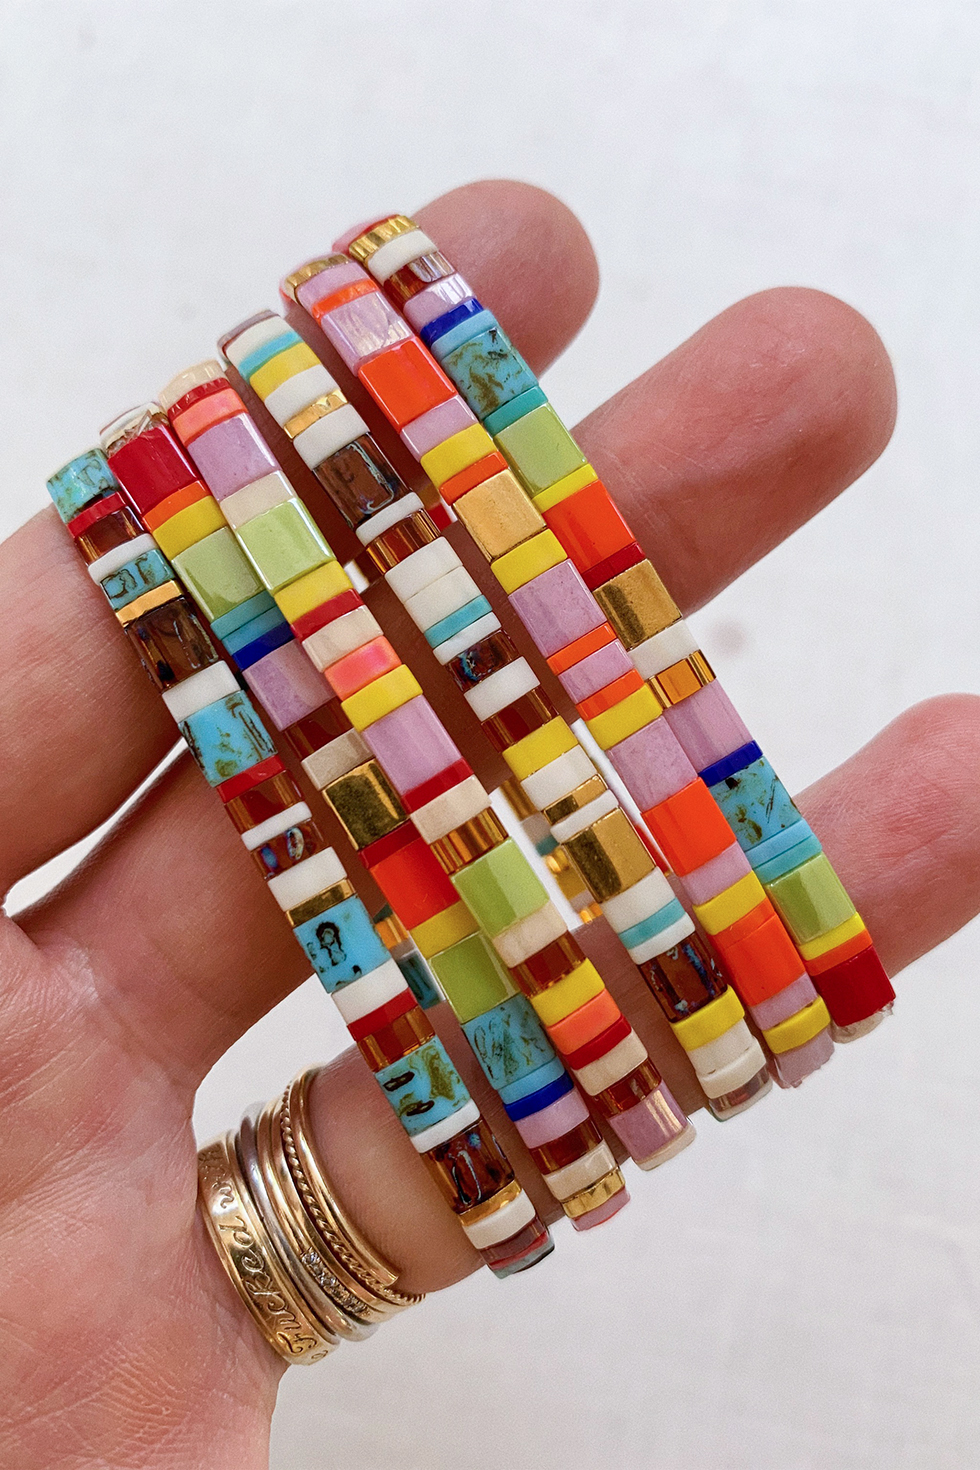 Miyuki bracelet 24k gold plated beads white golden friendship for women,stacking bracelet,handmade,jewelry,boho,bohemian,minimalist,unique